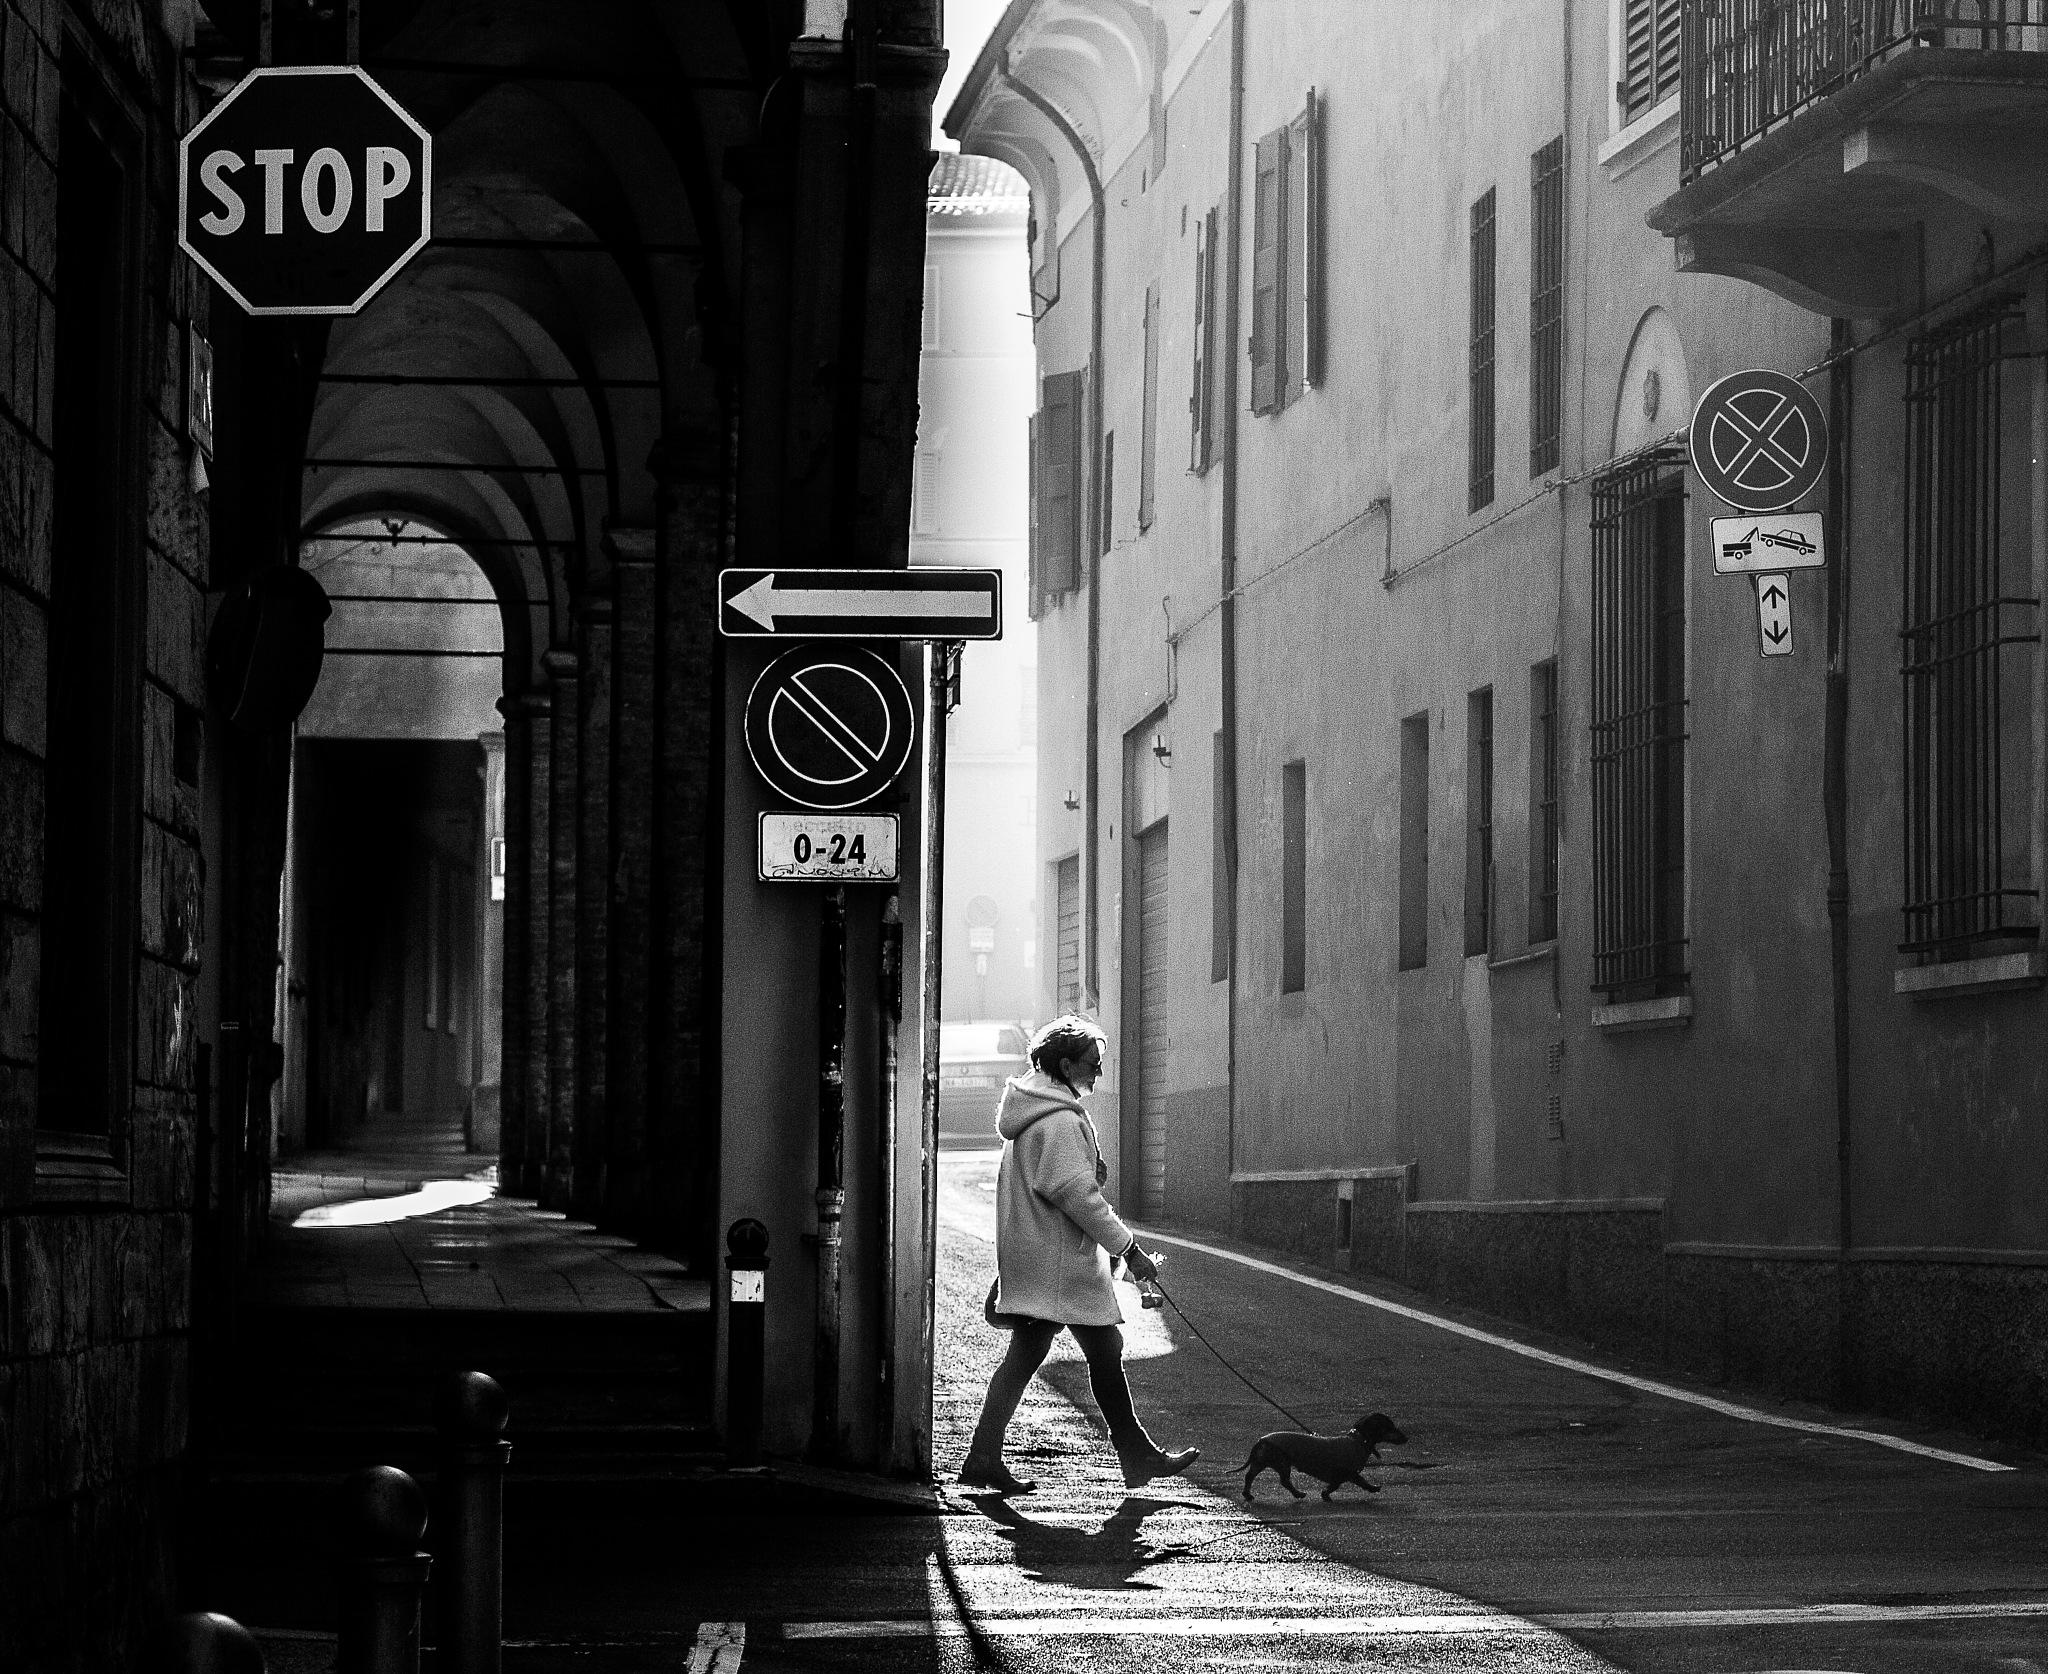 Italian Street Photography by Saidmir503